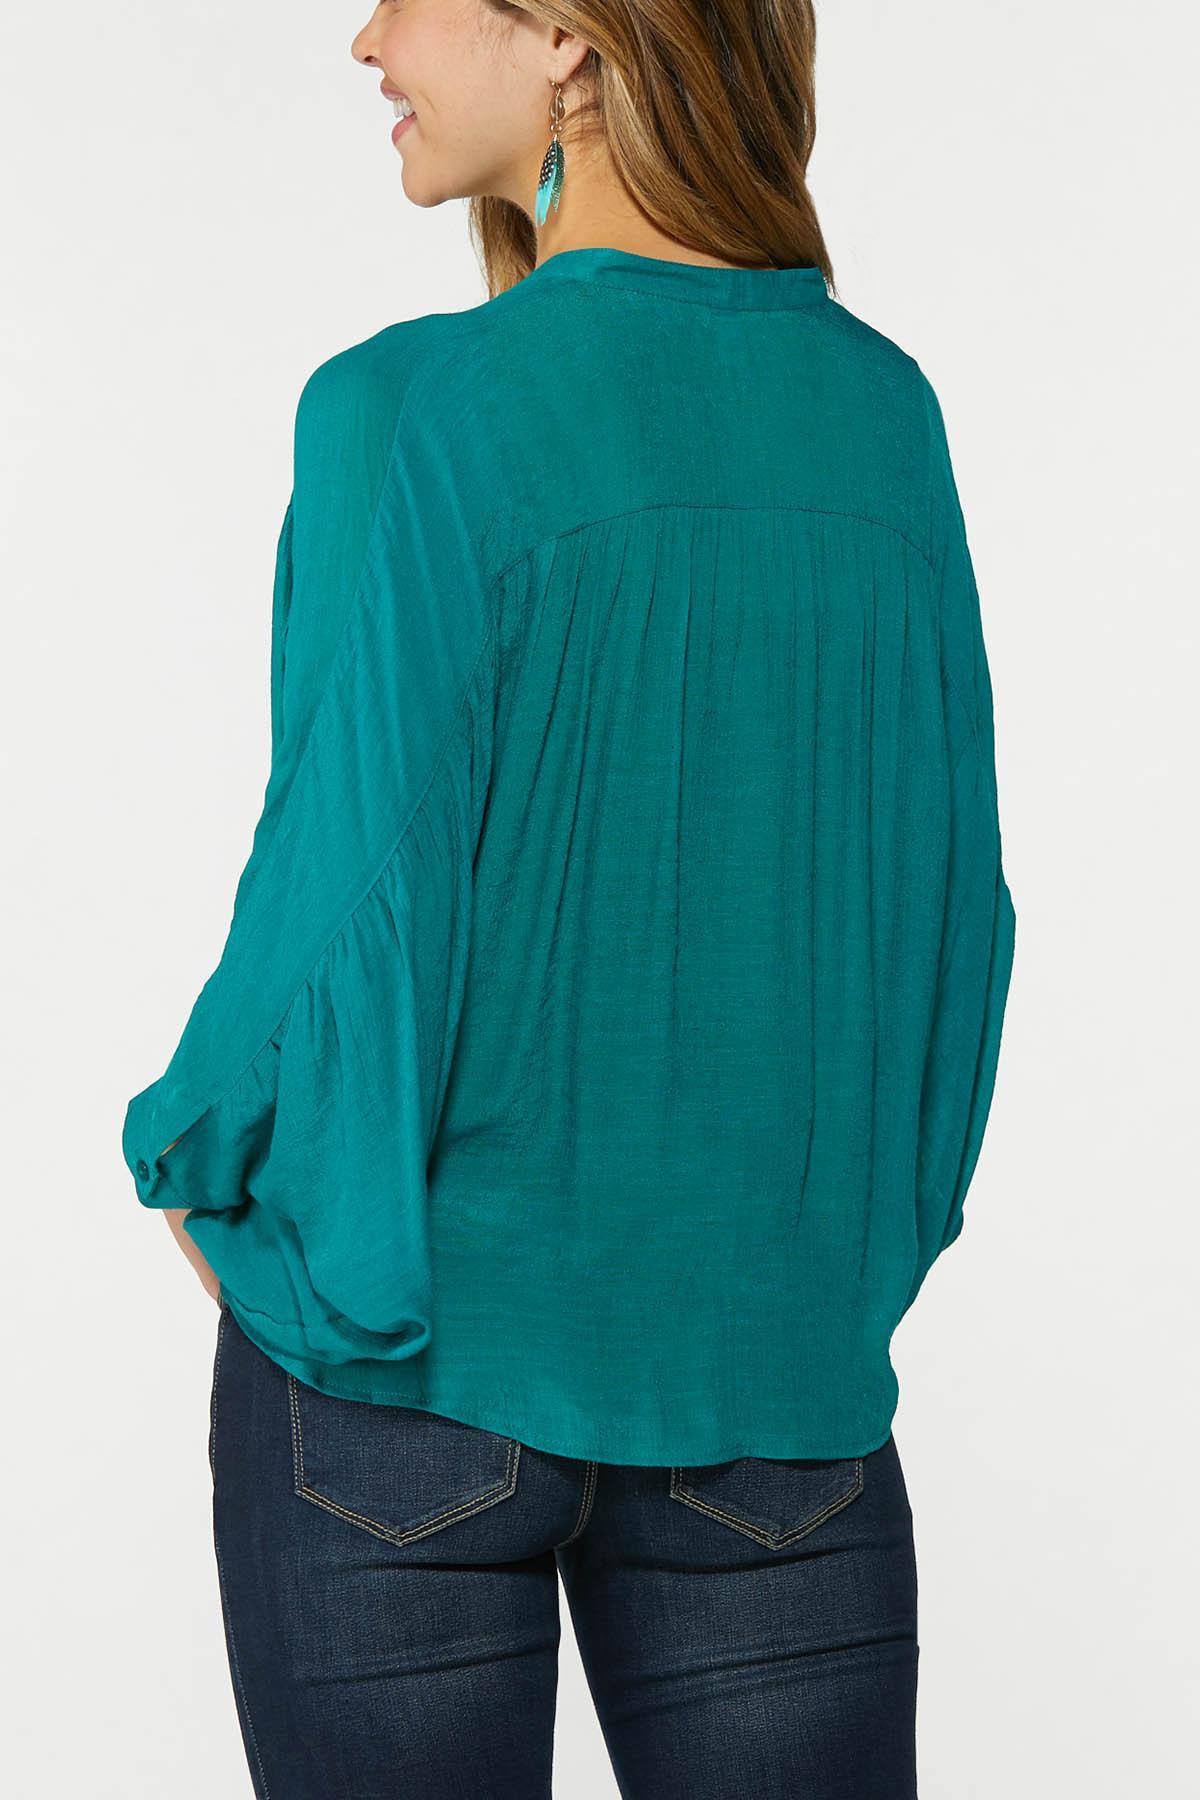 Plus Size Teal Dolman Sleeve Top (Item #44749981)